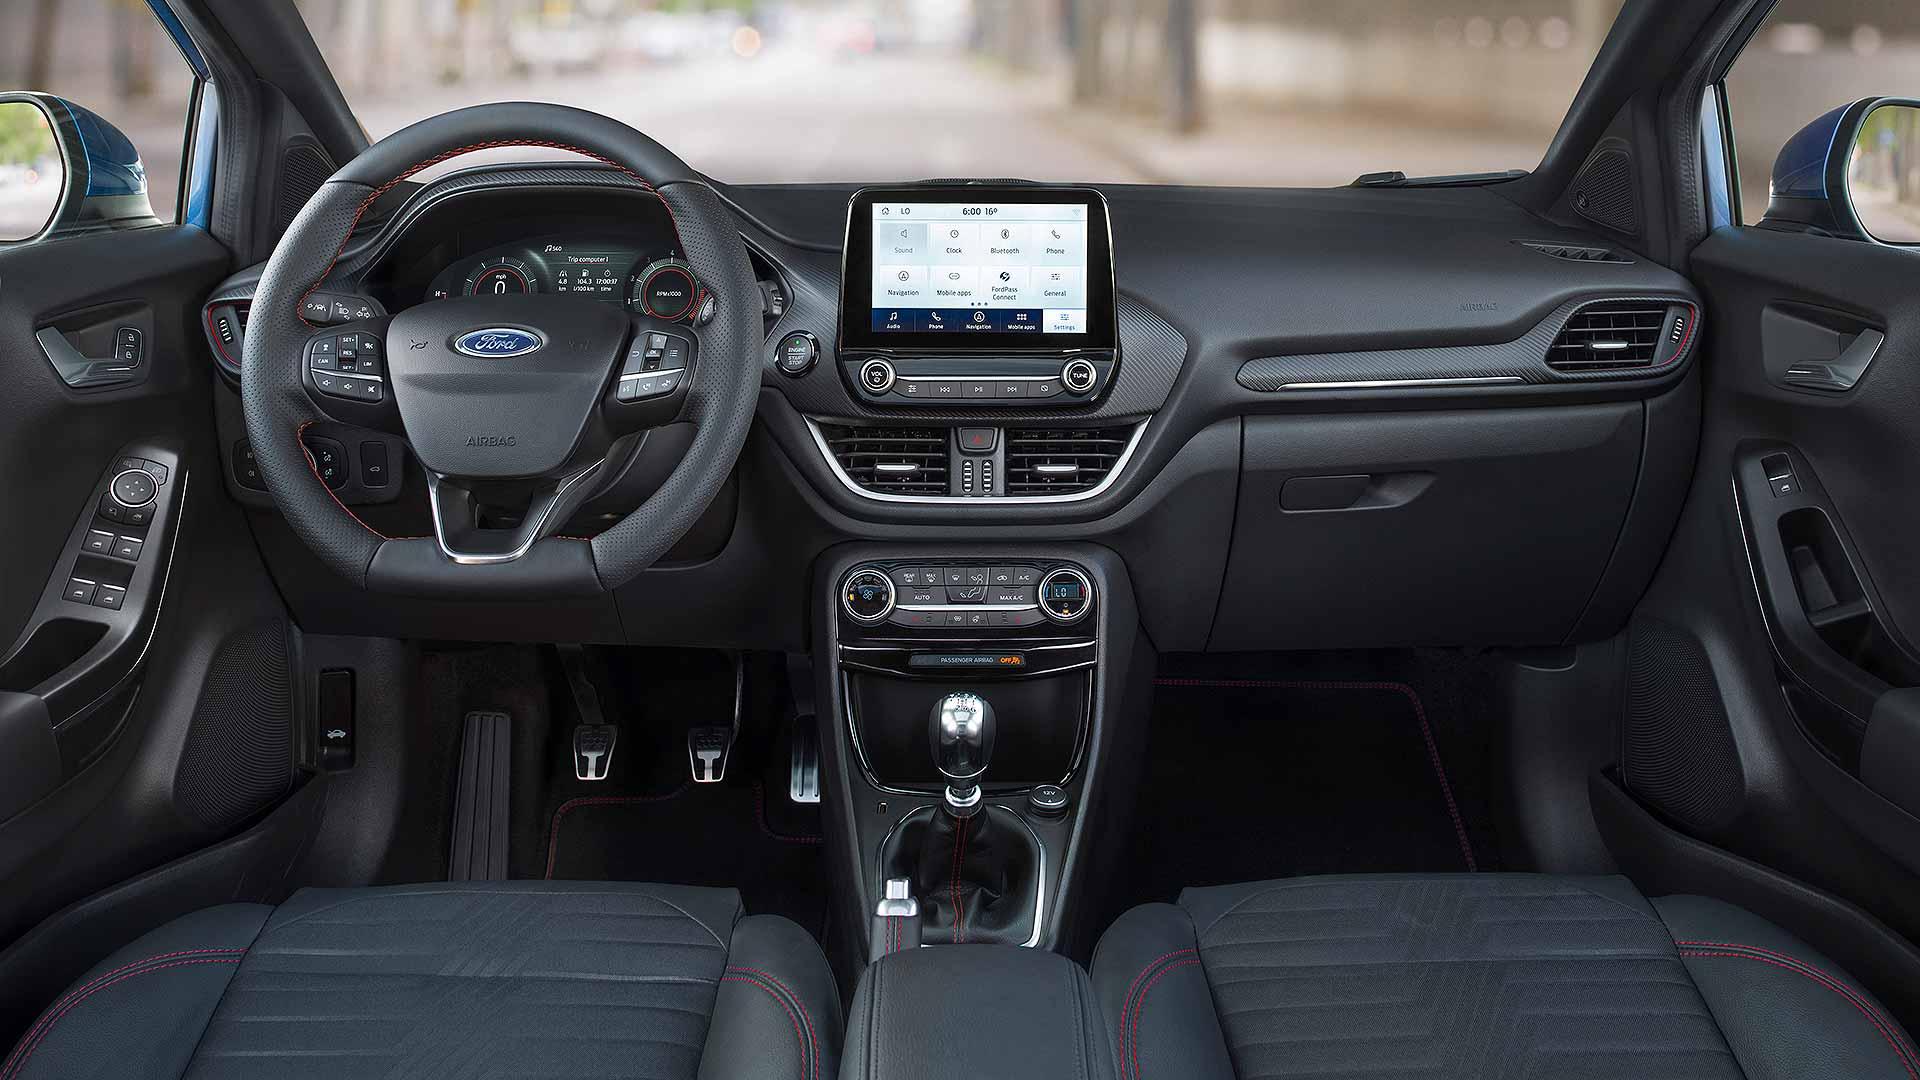 New Ford Puma small SUV